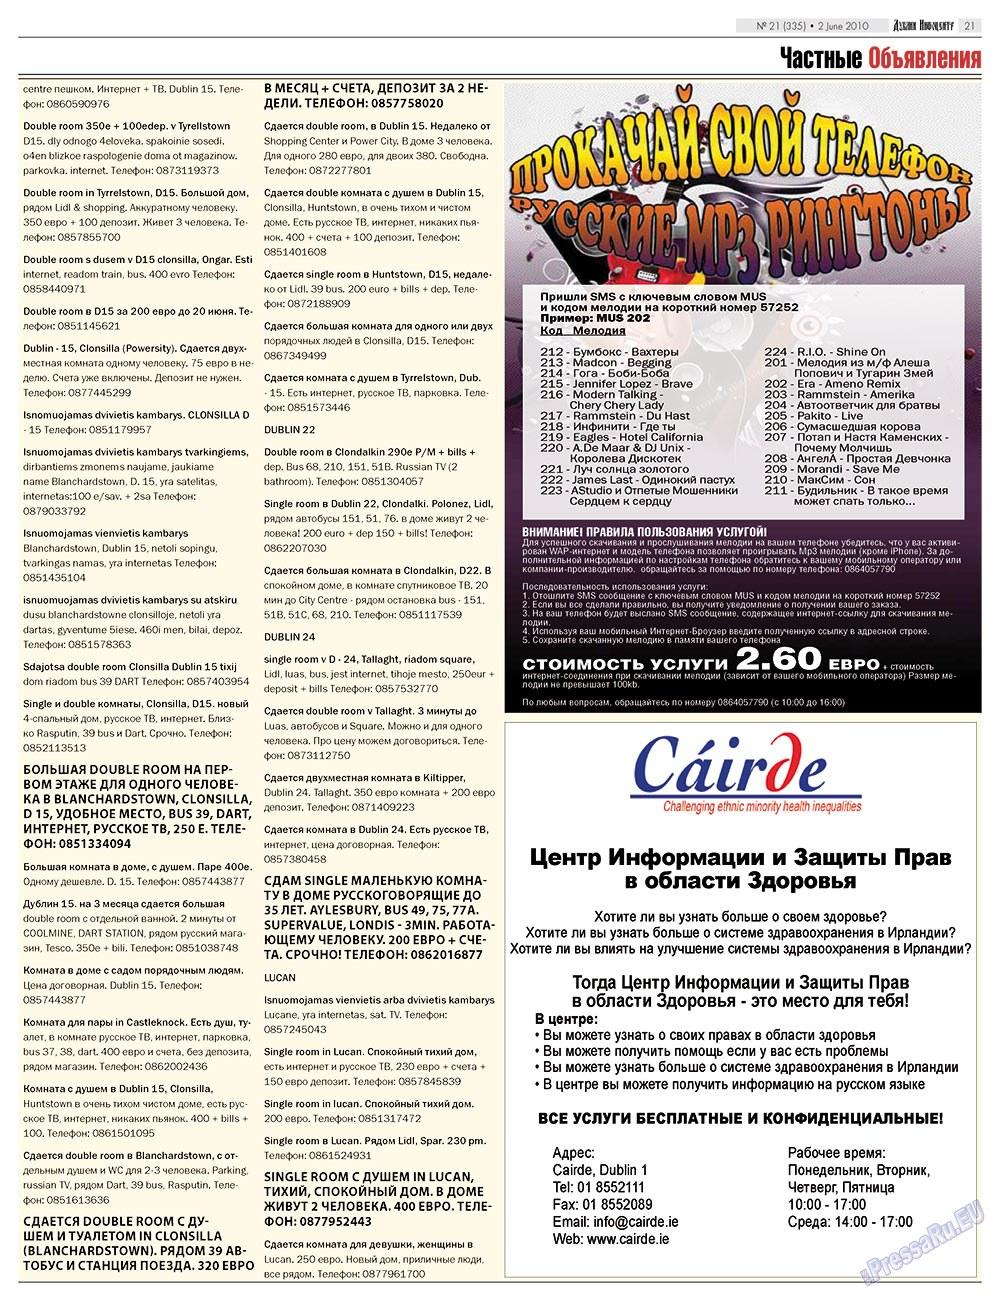 Дублин инфоцентр (газета). 2010 год, номер 21, стр. 21